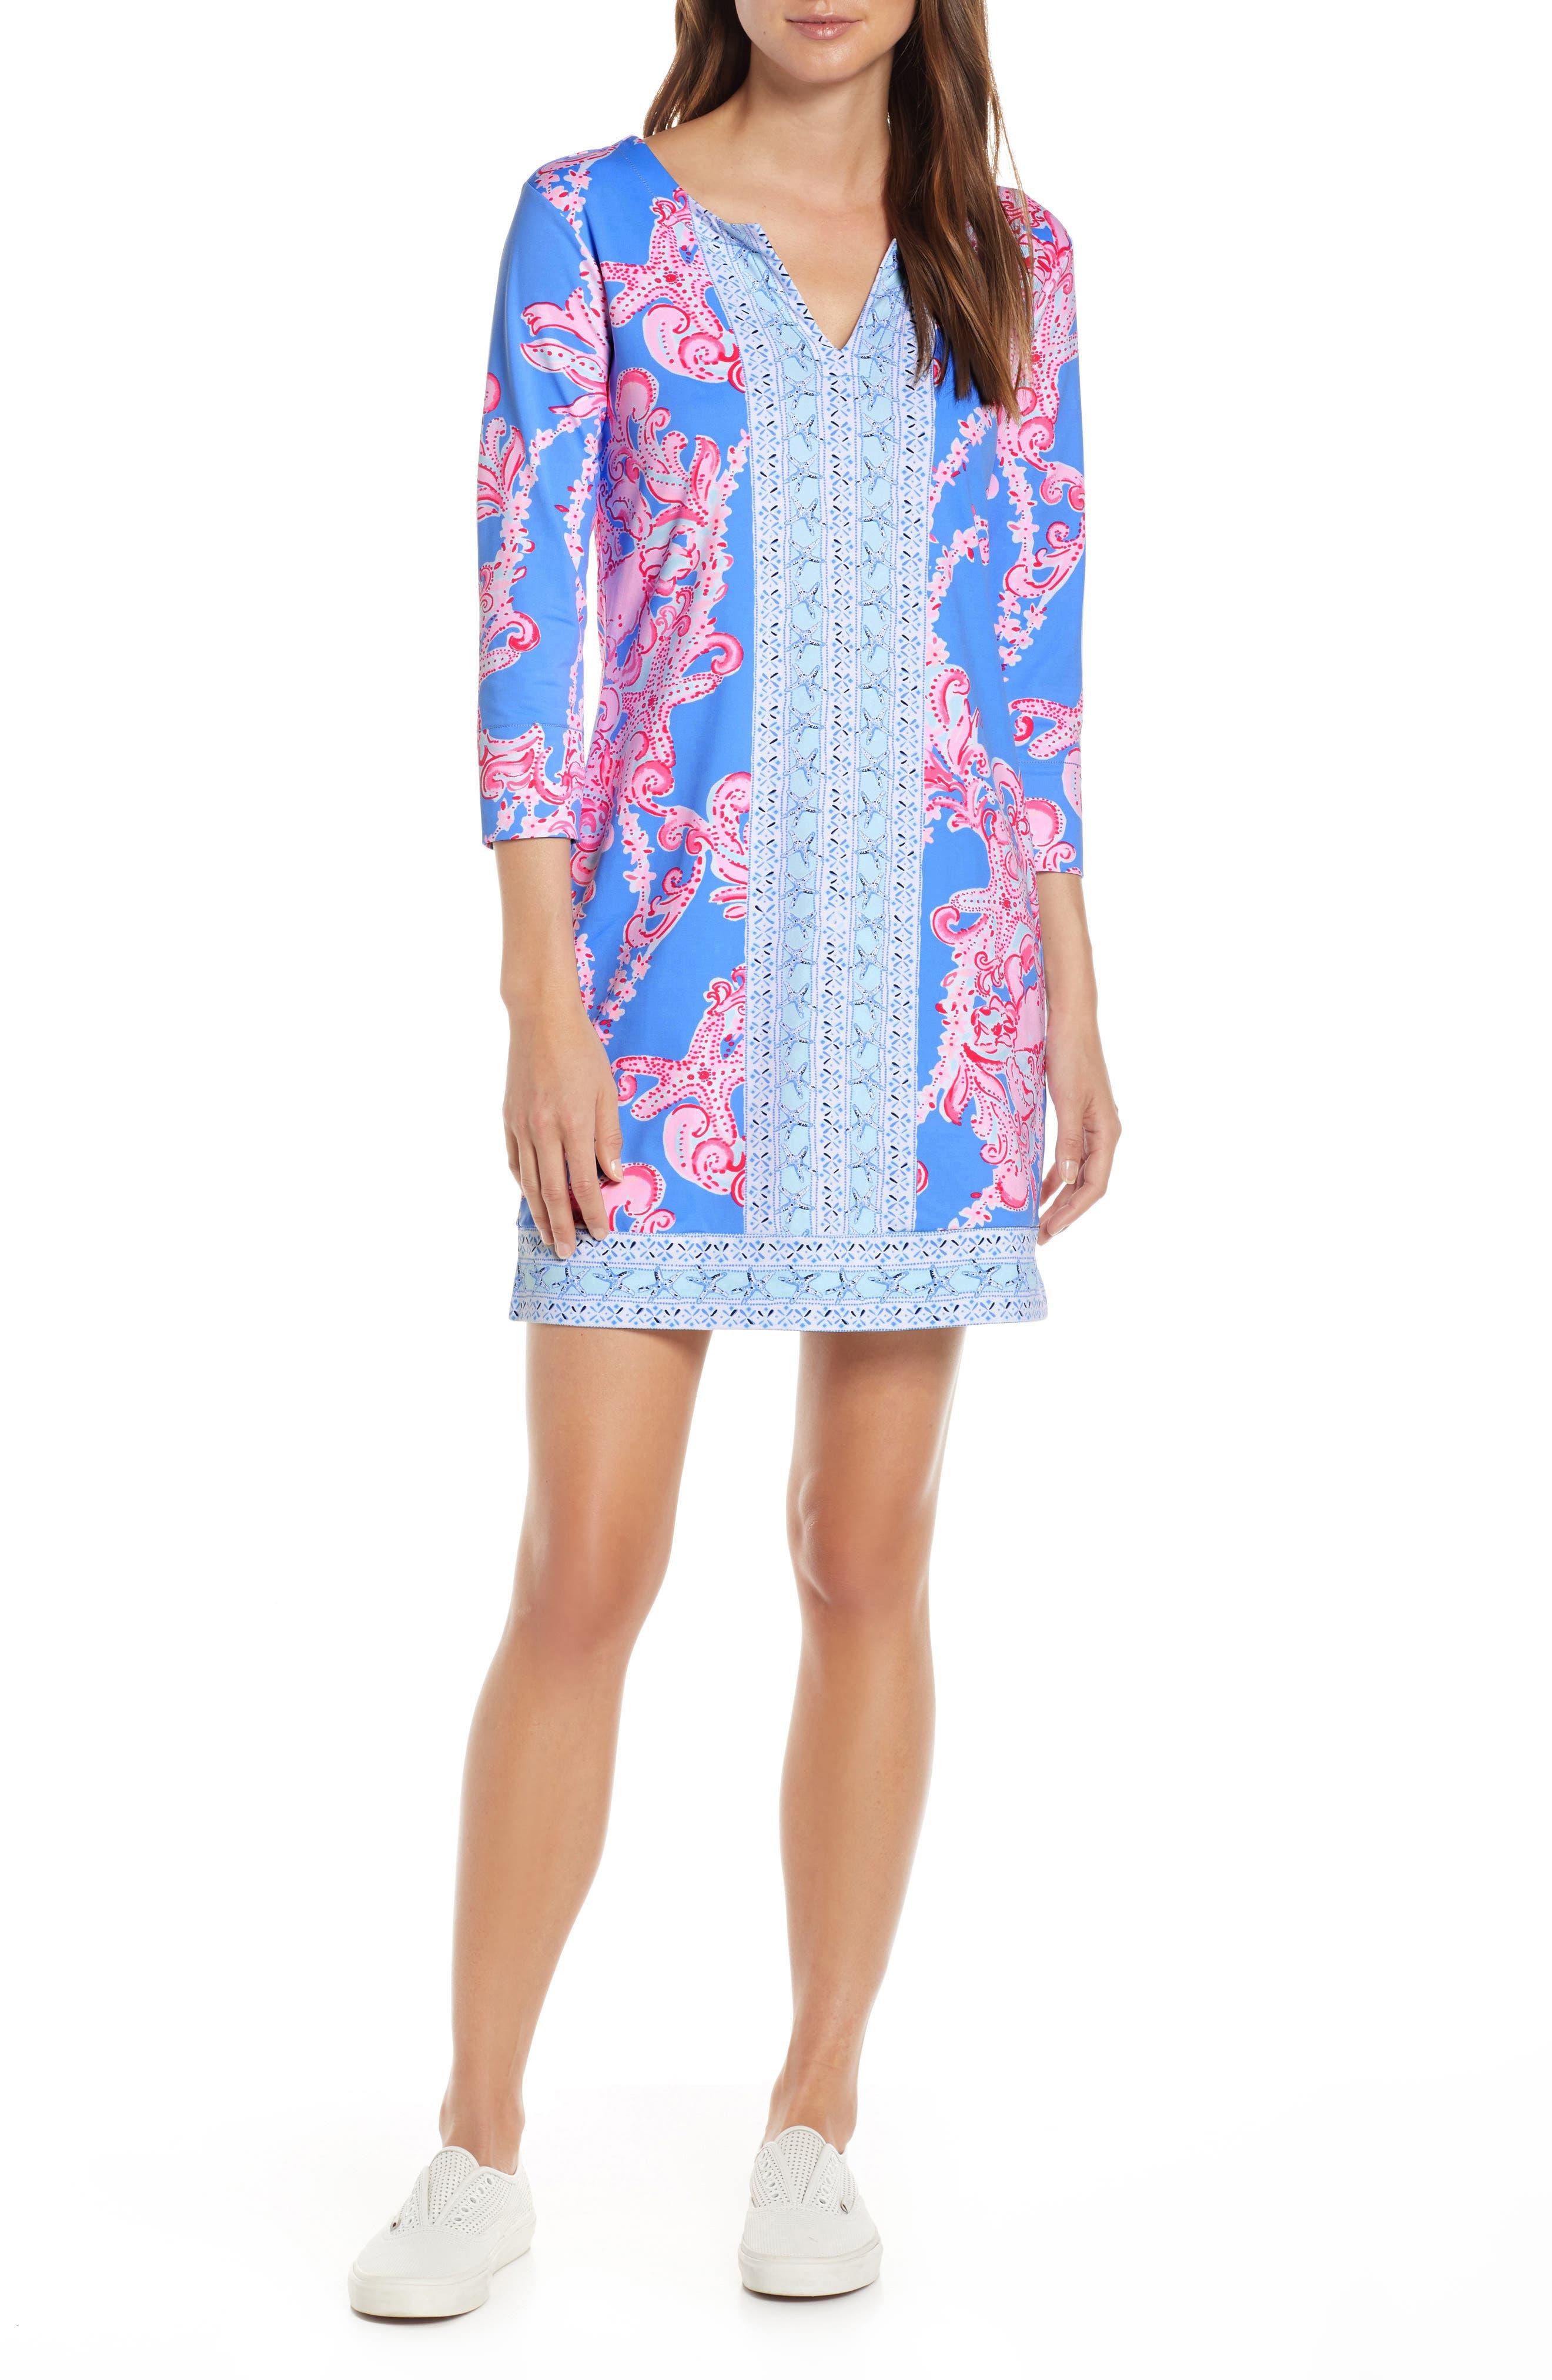 Lilly Pulitzer Nadine Upf 50+ Shift Dress, Blue